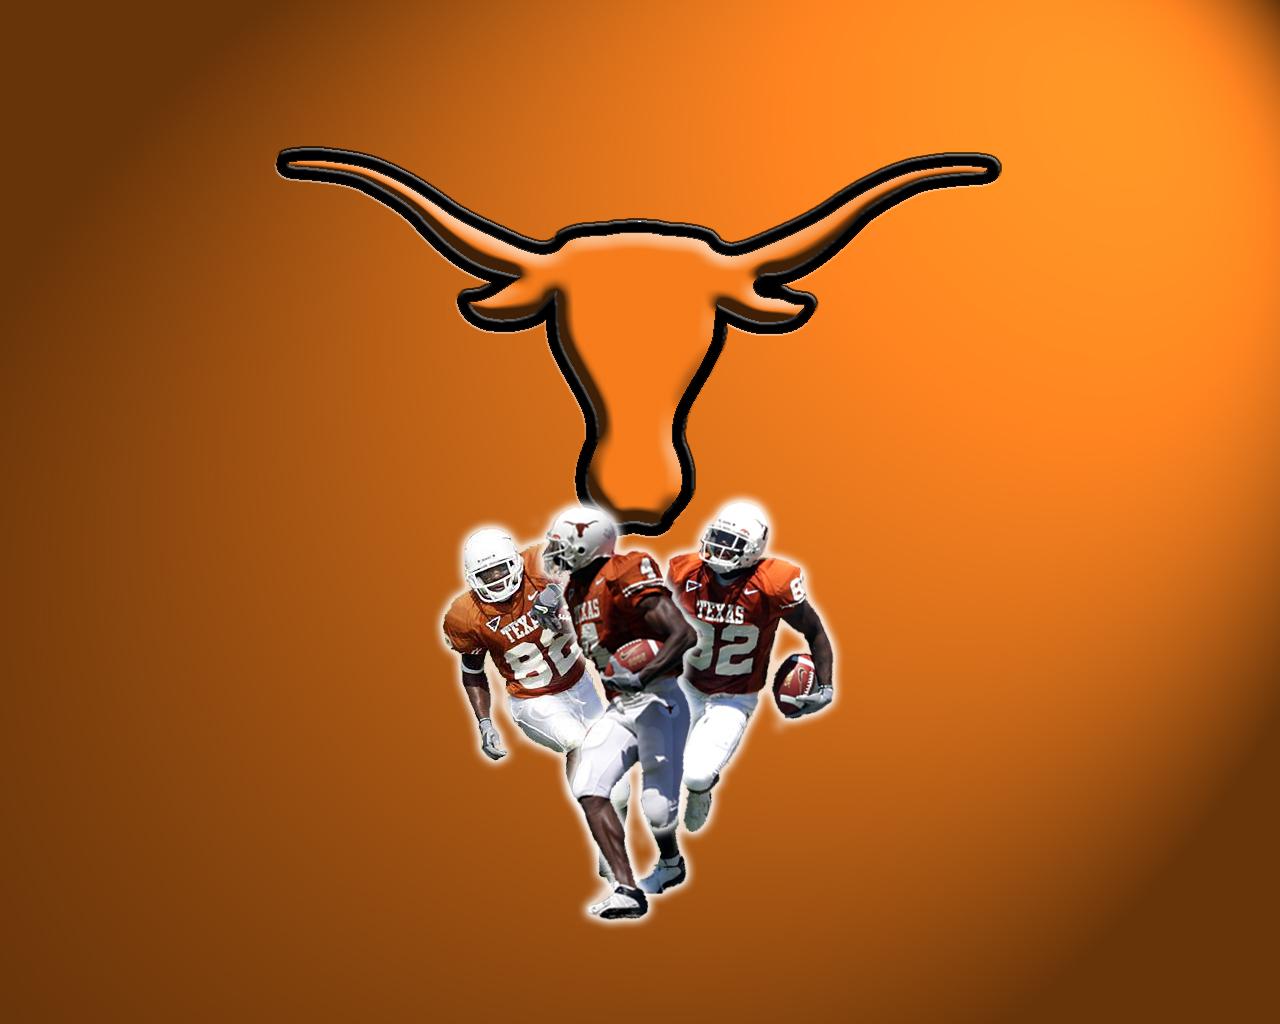 Free download Texas Longhorns Football